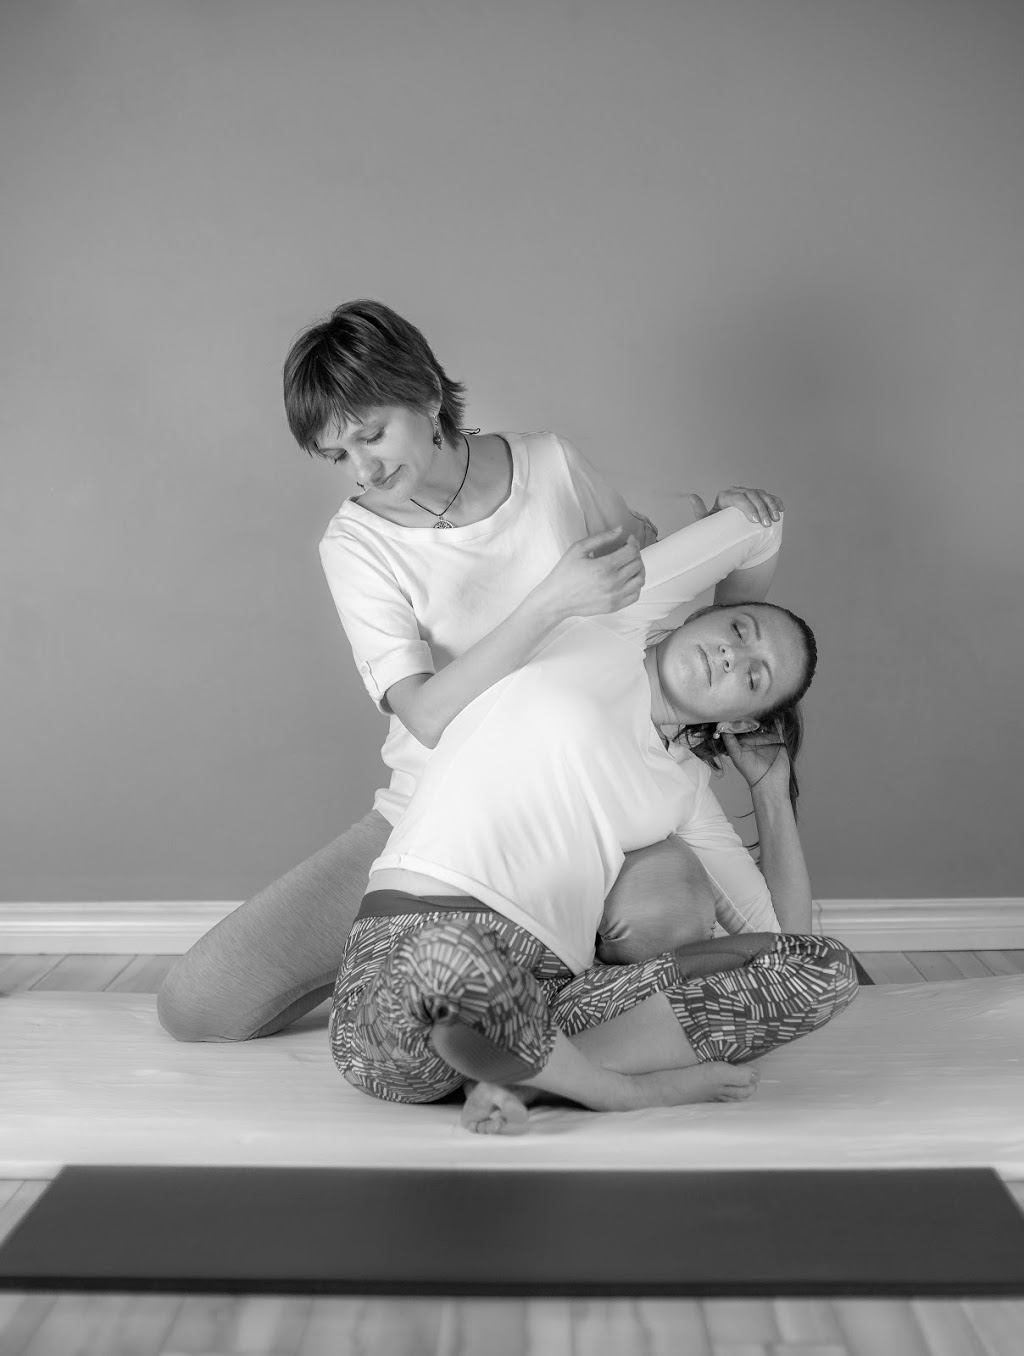 MettaClinic - Clinique de médecine douce - Yoga & Massage Thaï   school   3035 Rue William, Saint-Hubert, QC J4T 2W7, Canada   4388773772 OR +1 438-877-3772